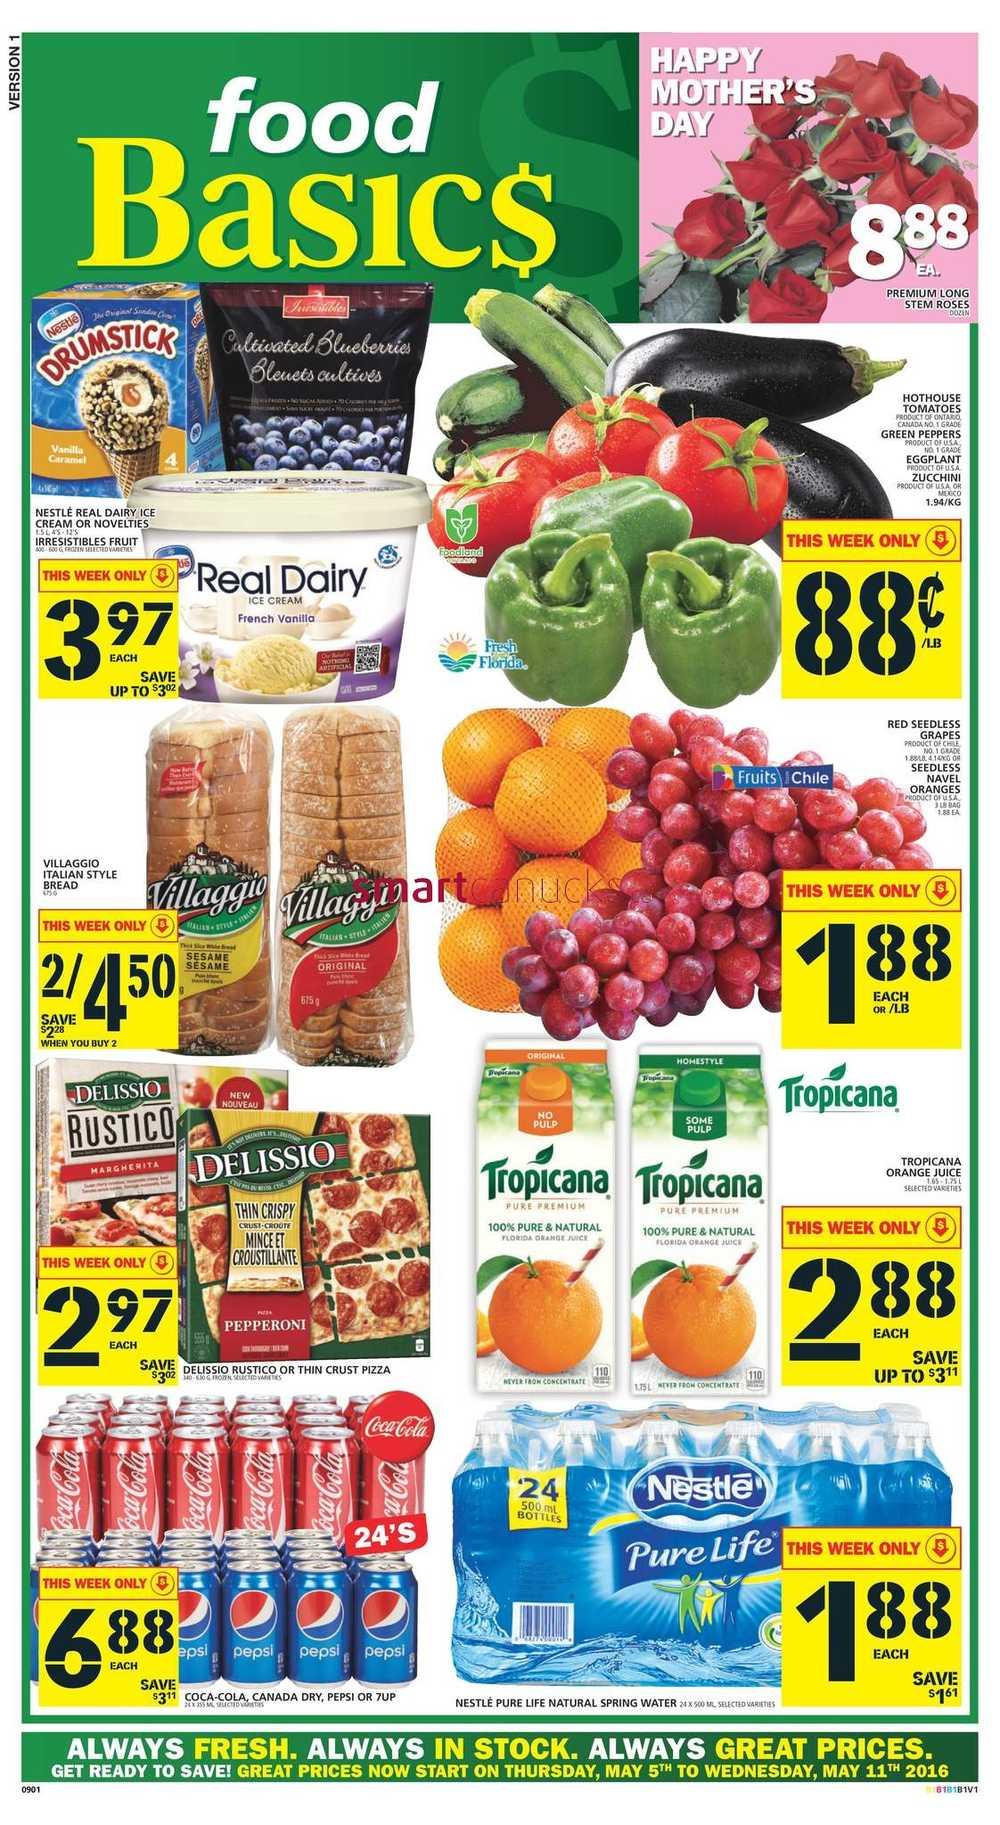 Food Basics Flyer May 5 To 11